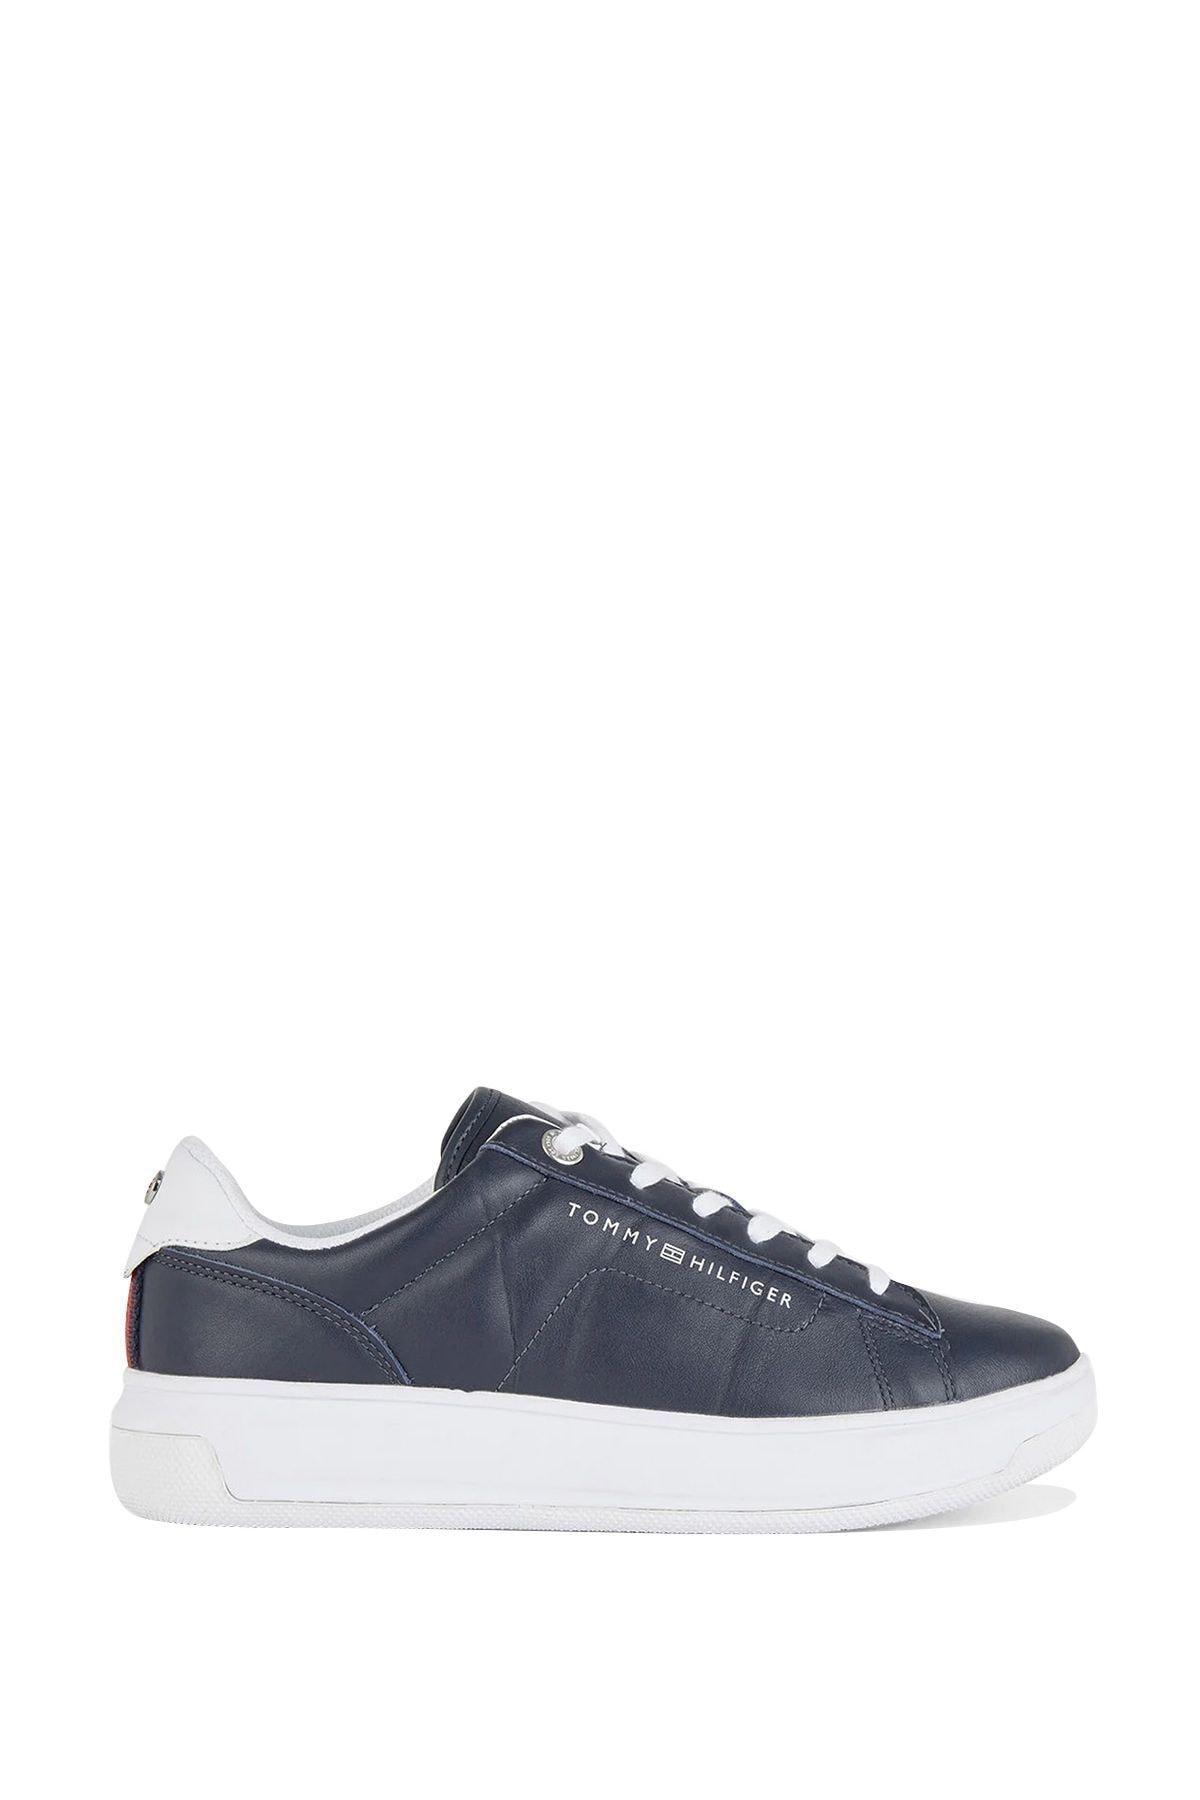 Tommy Hilfiger Kadın Siyah Leather Cupsole Kadın Sneaker 2